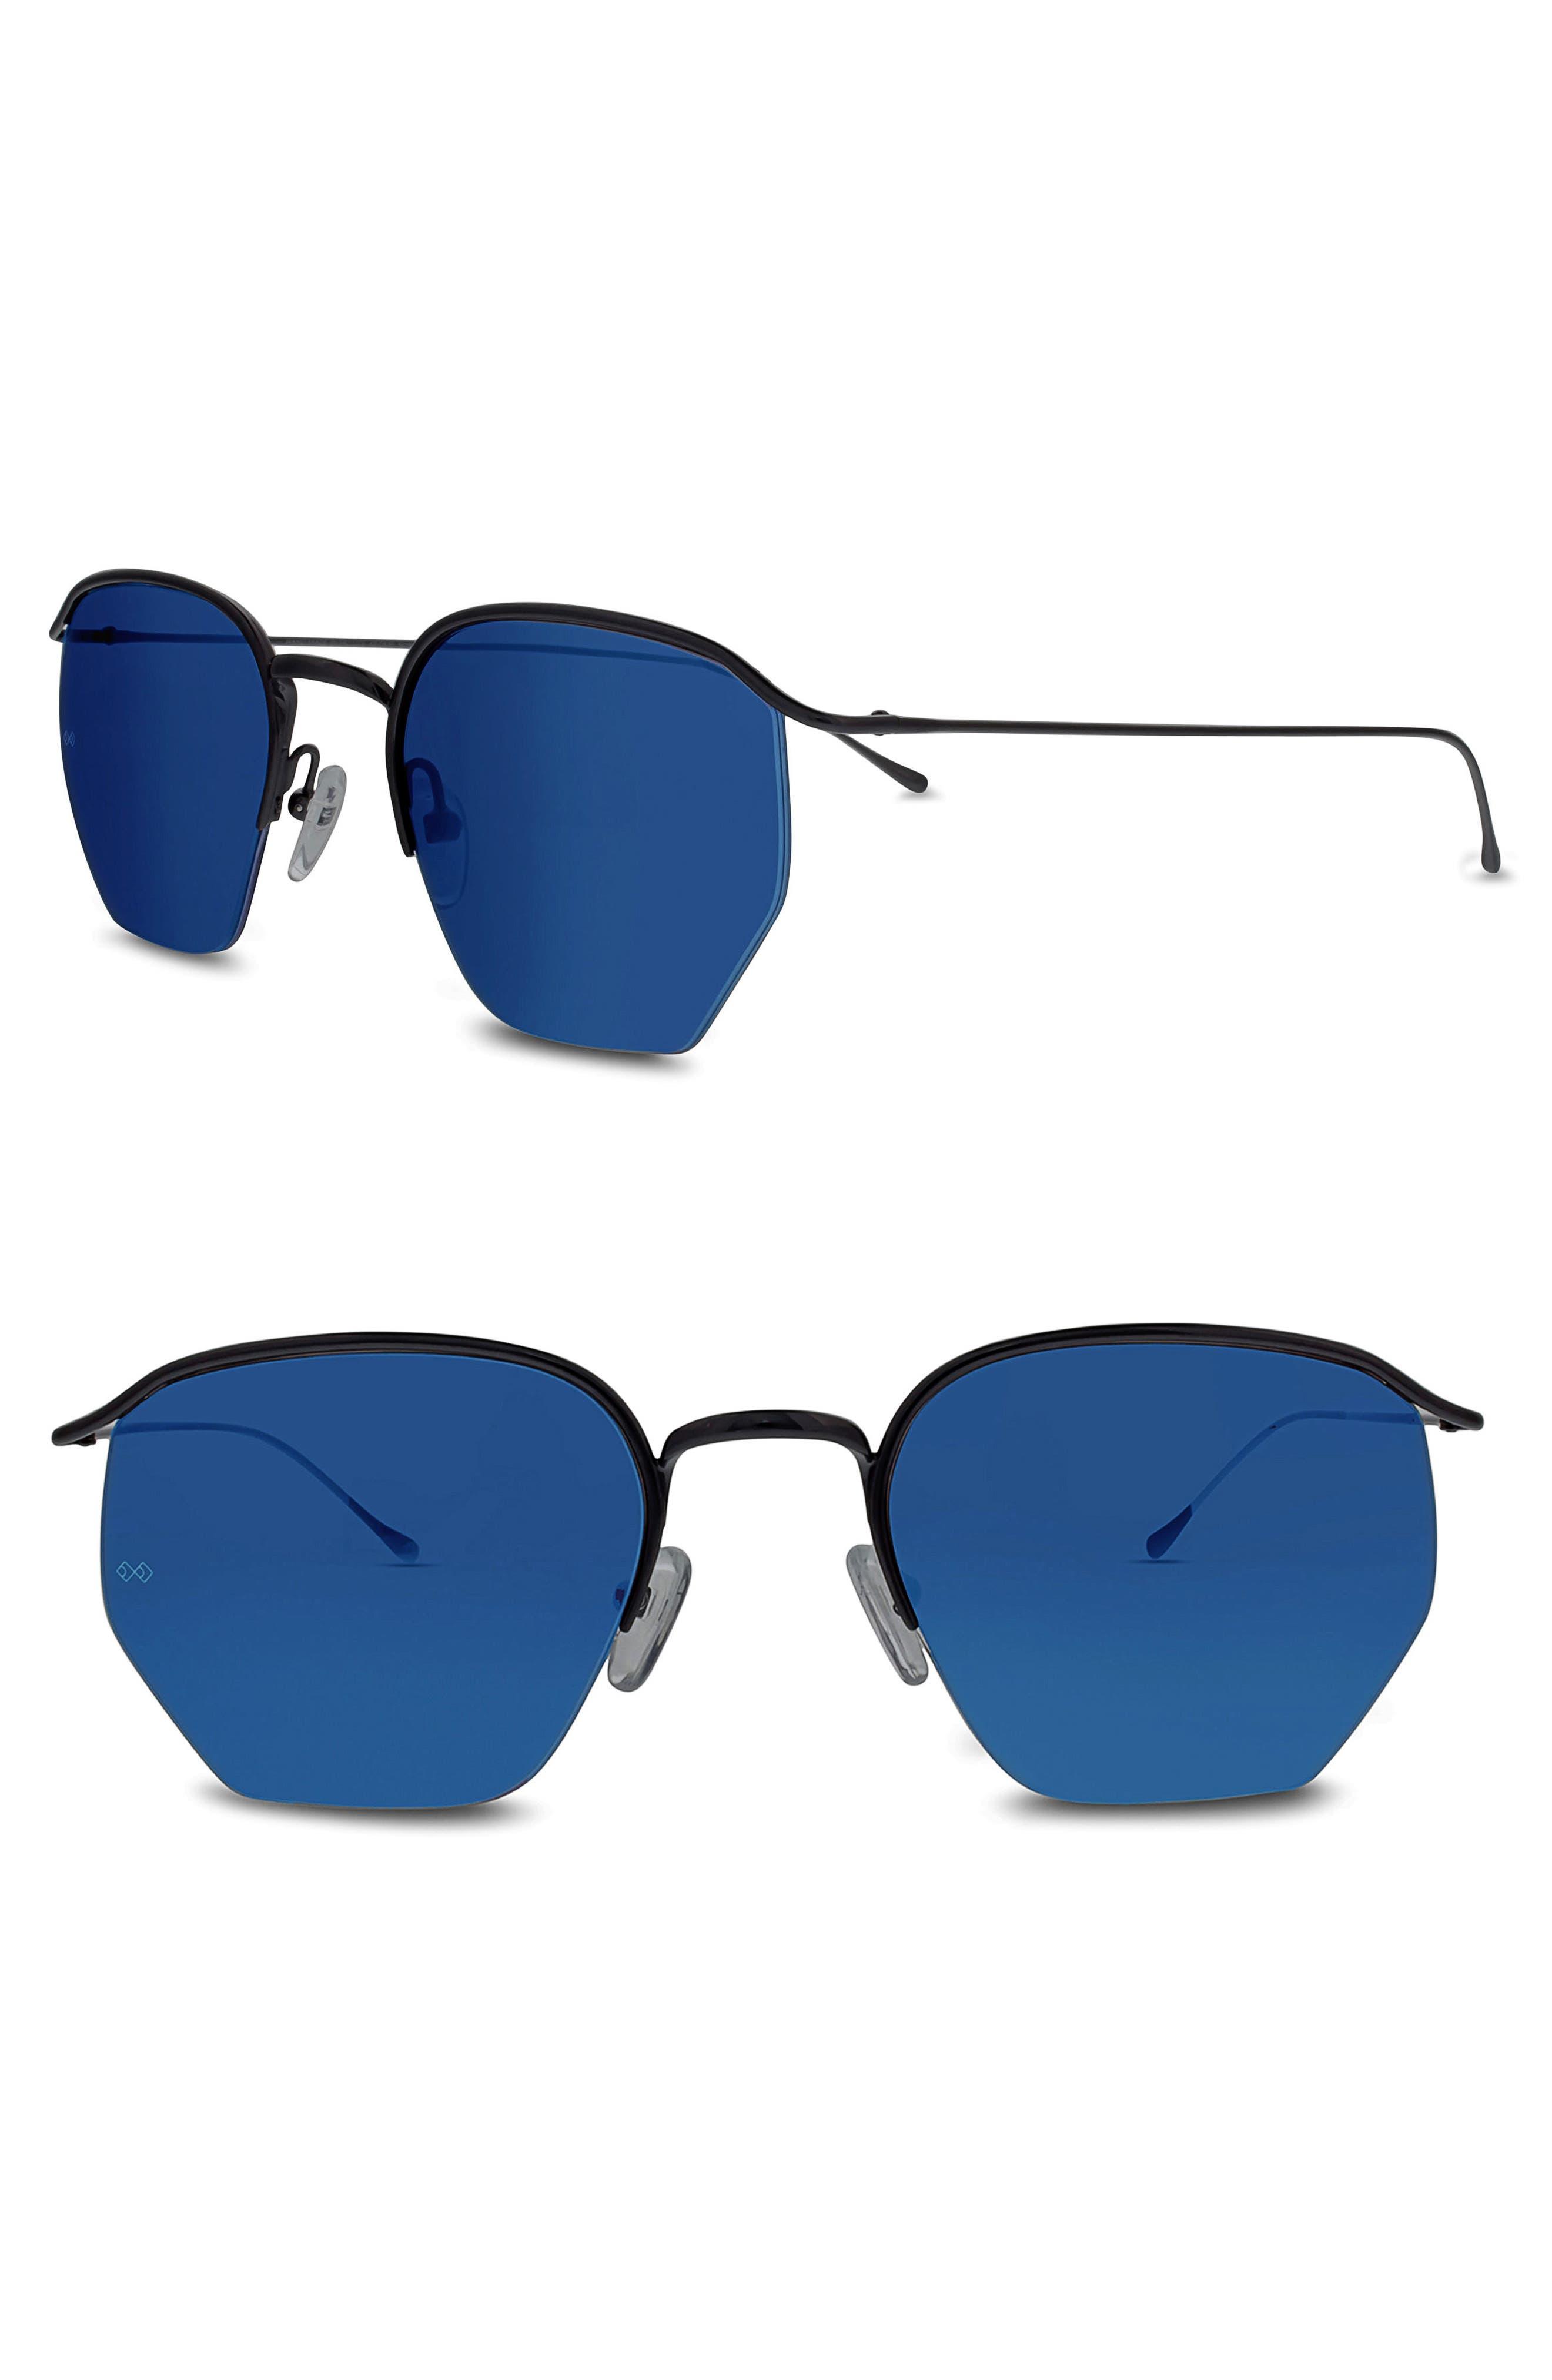 SMOKE X MIRRORS, Geo I 51mm Semi Rimless Sunglasses, Main thumbnail 1, color, 001